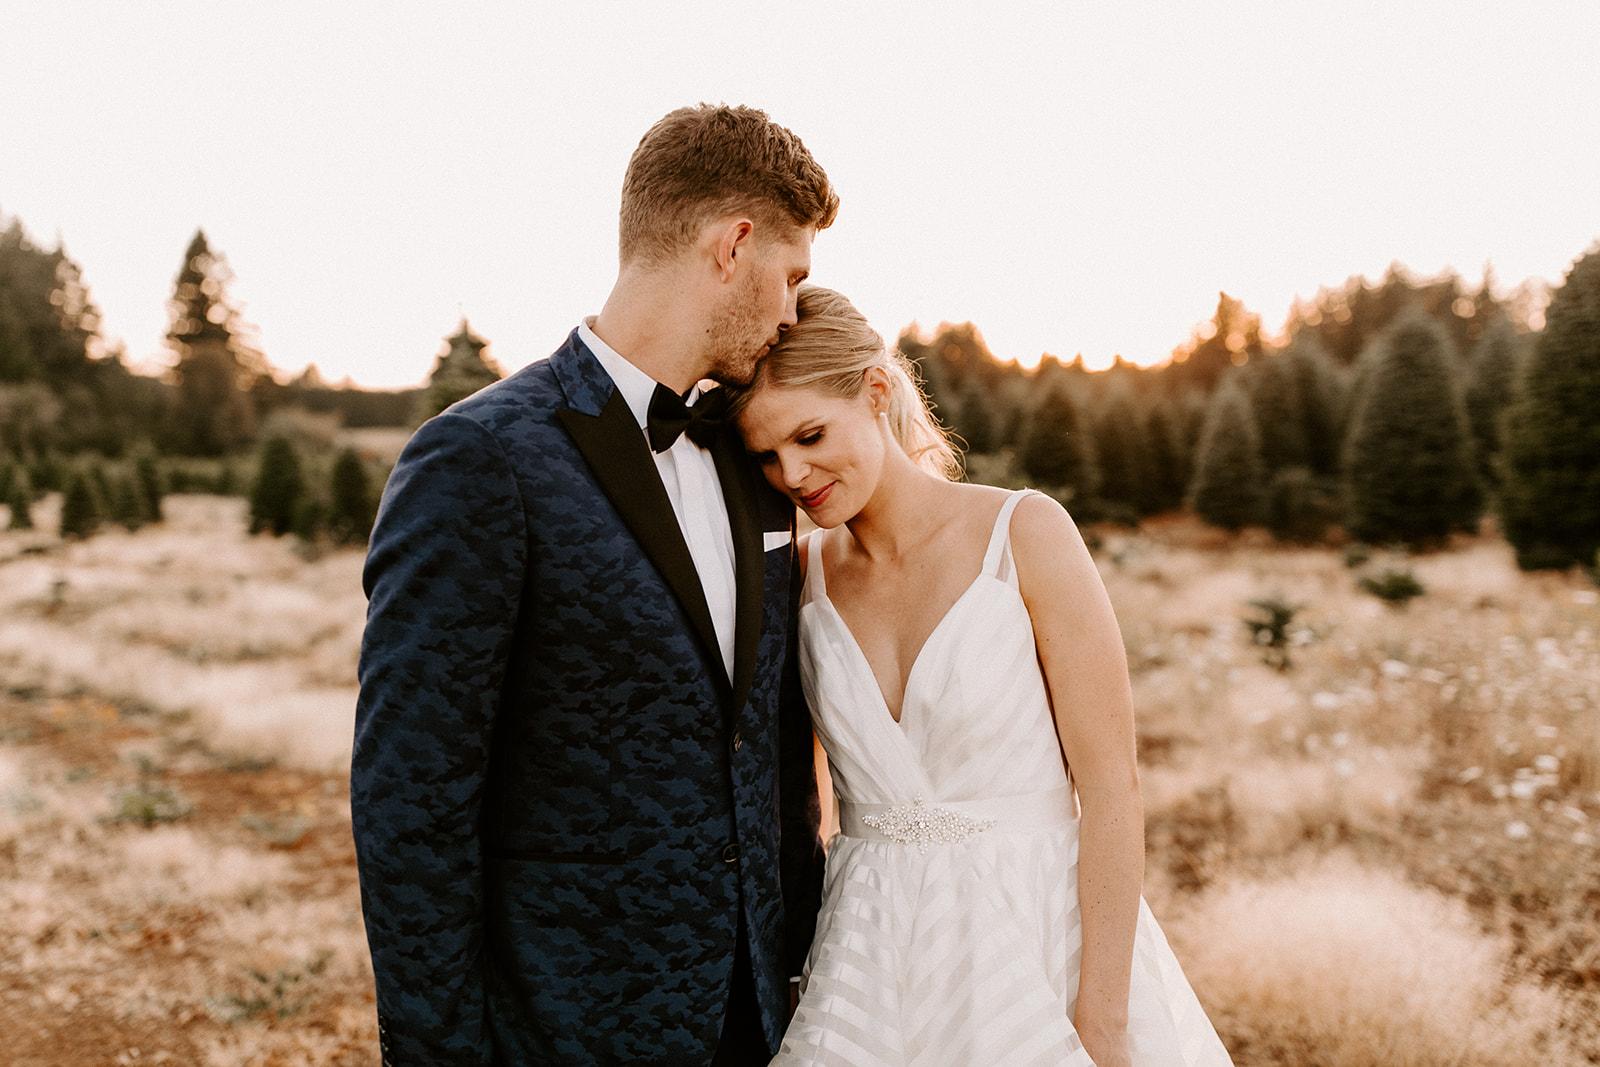 Bridalbliss.com | Portland Wedding | Oregon Event Planning and Design | Dawn Charles